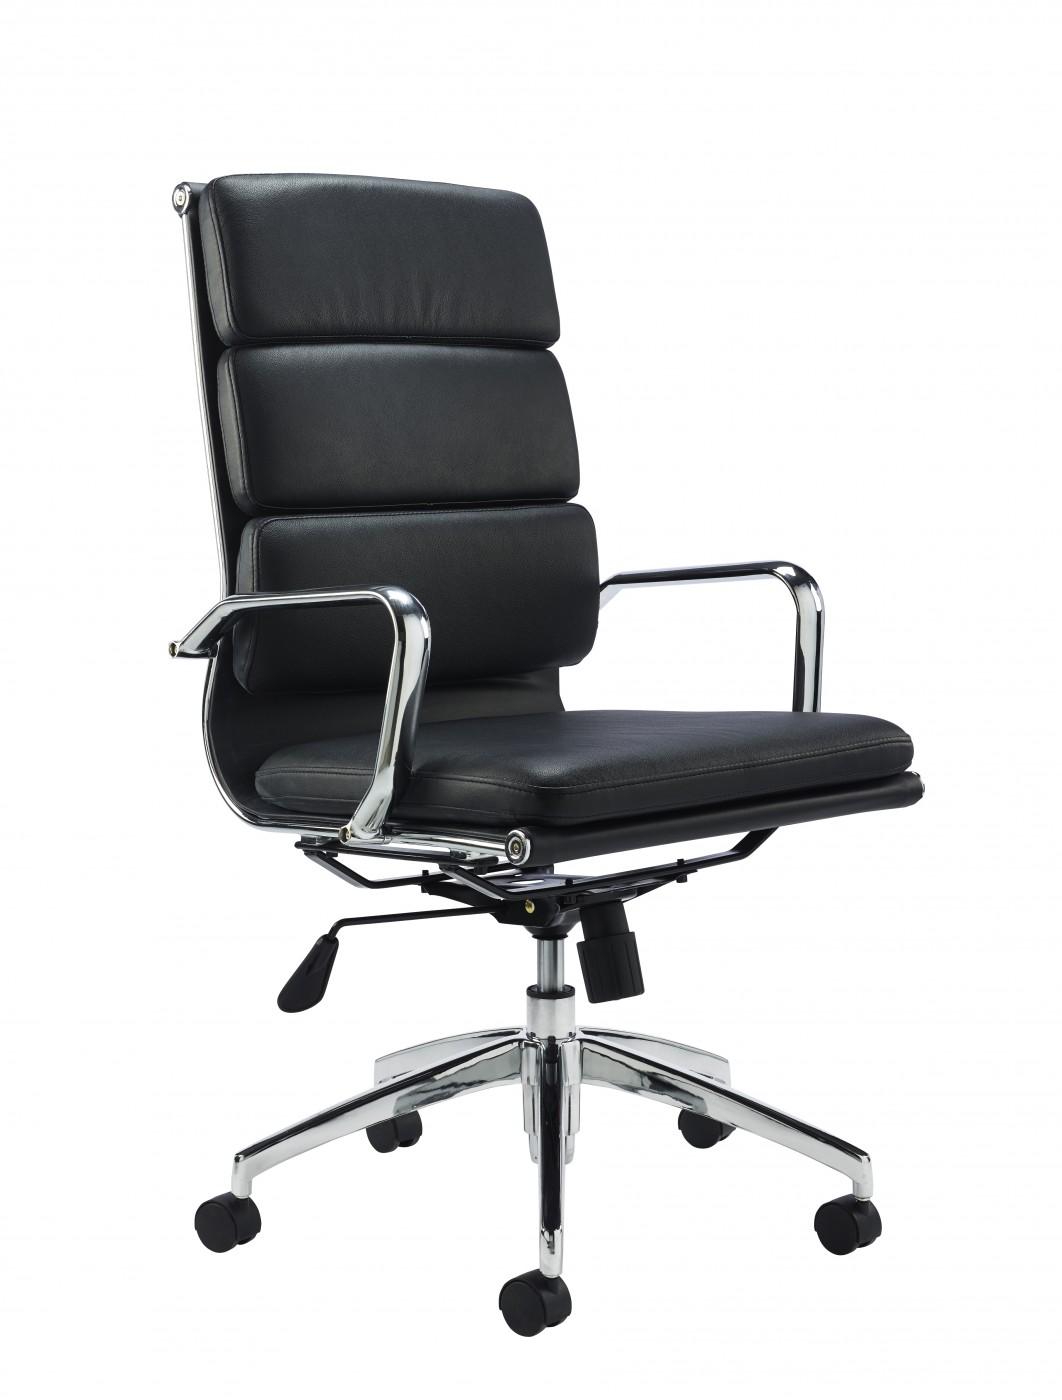 Apulia Black Leather Office Chair N0253BK